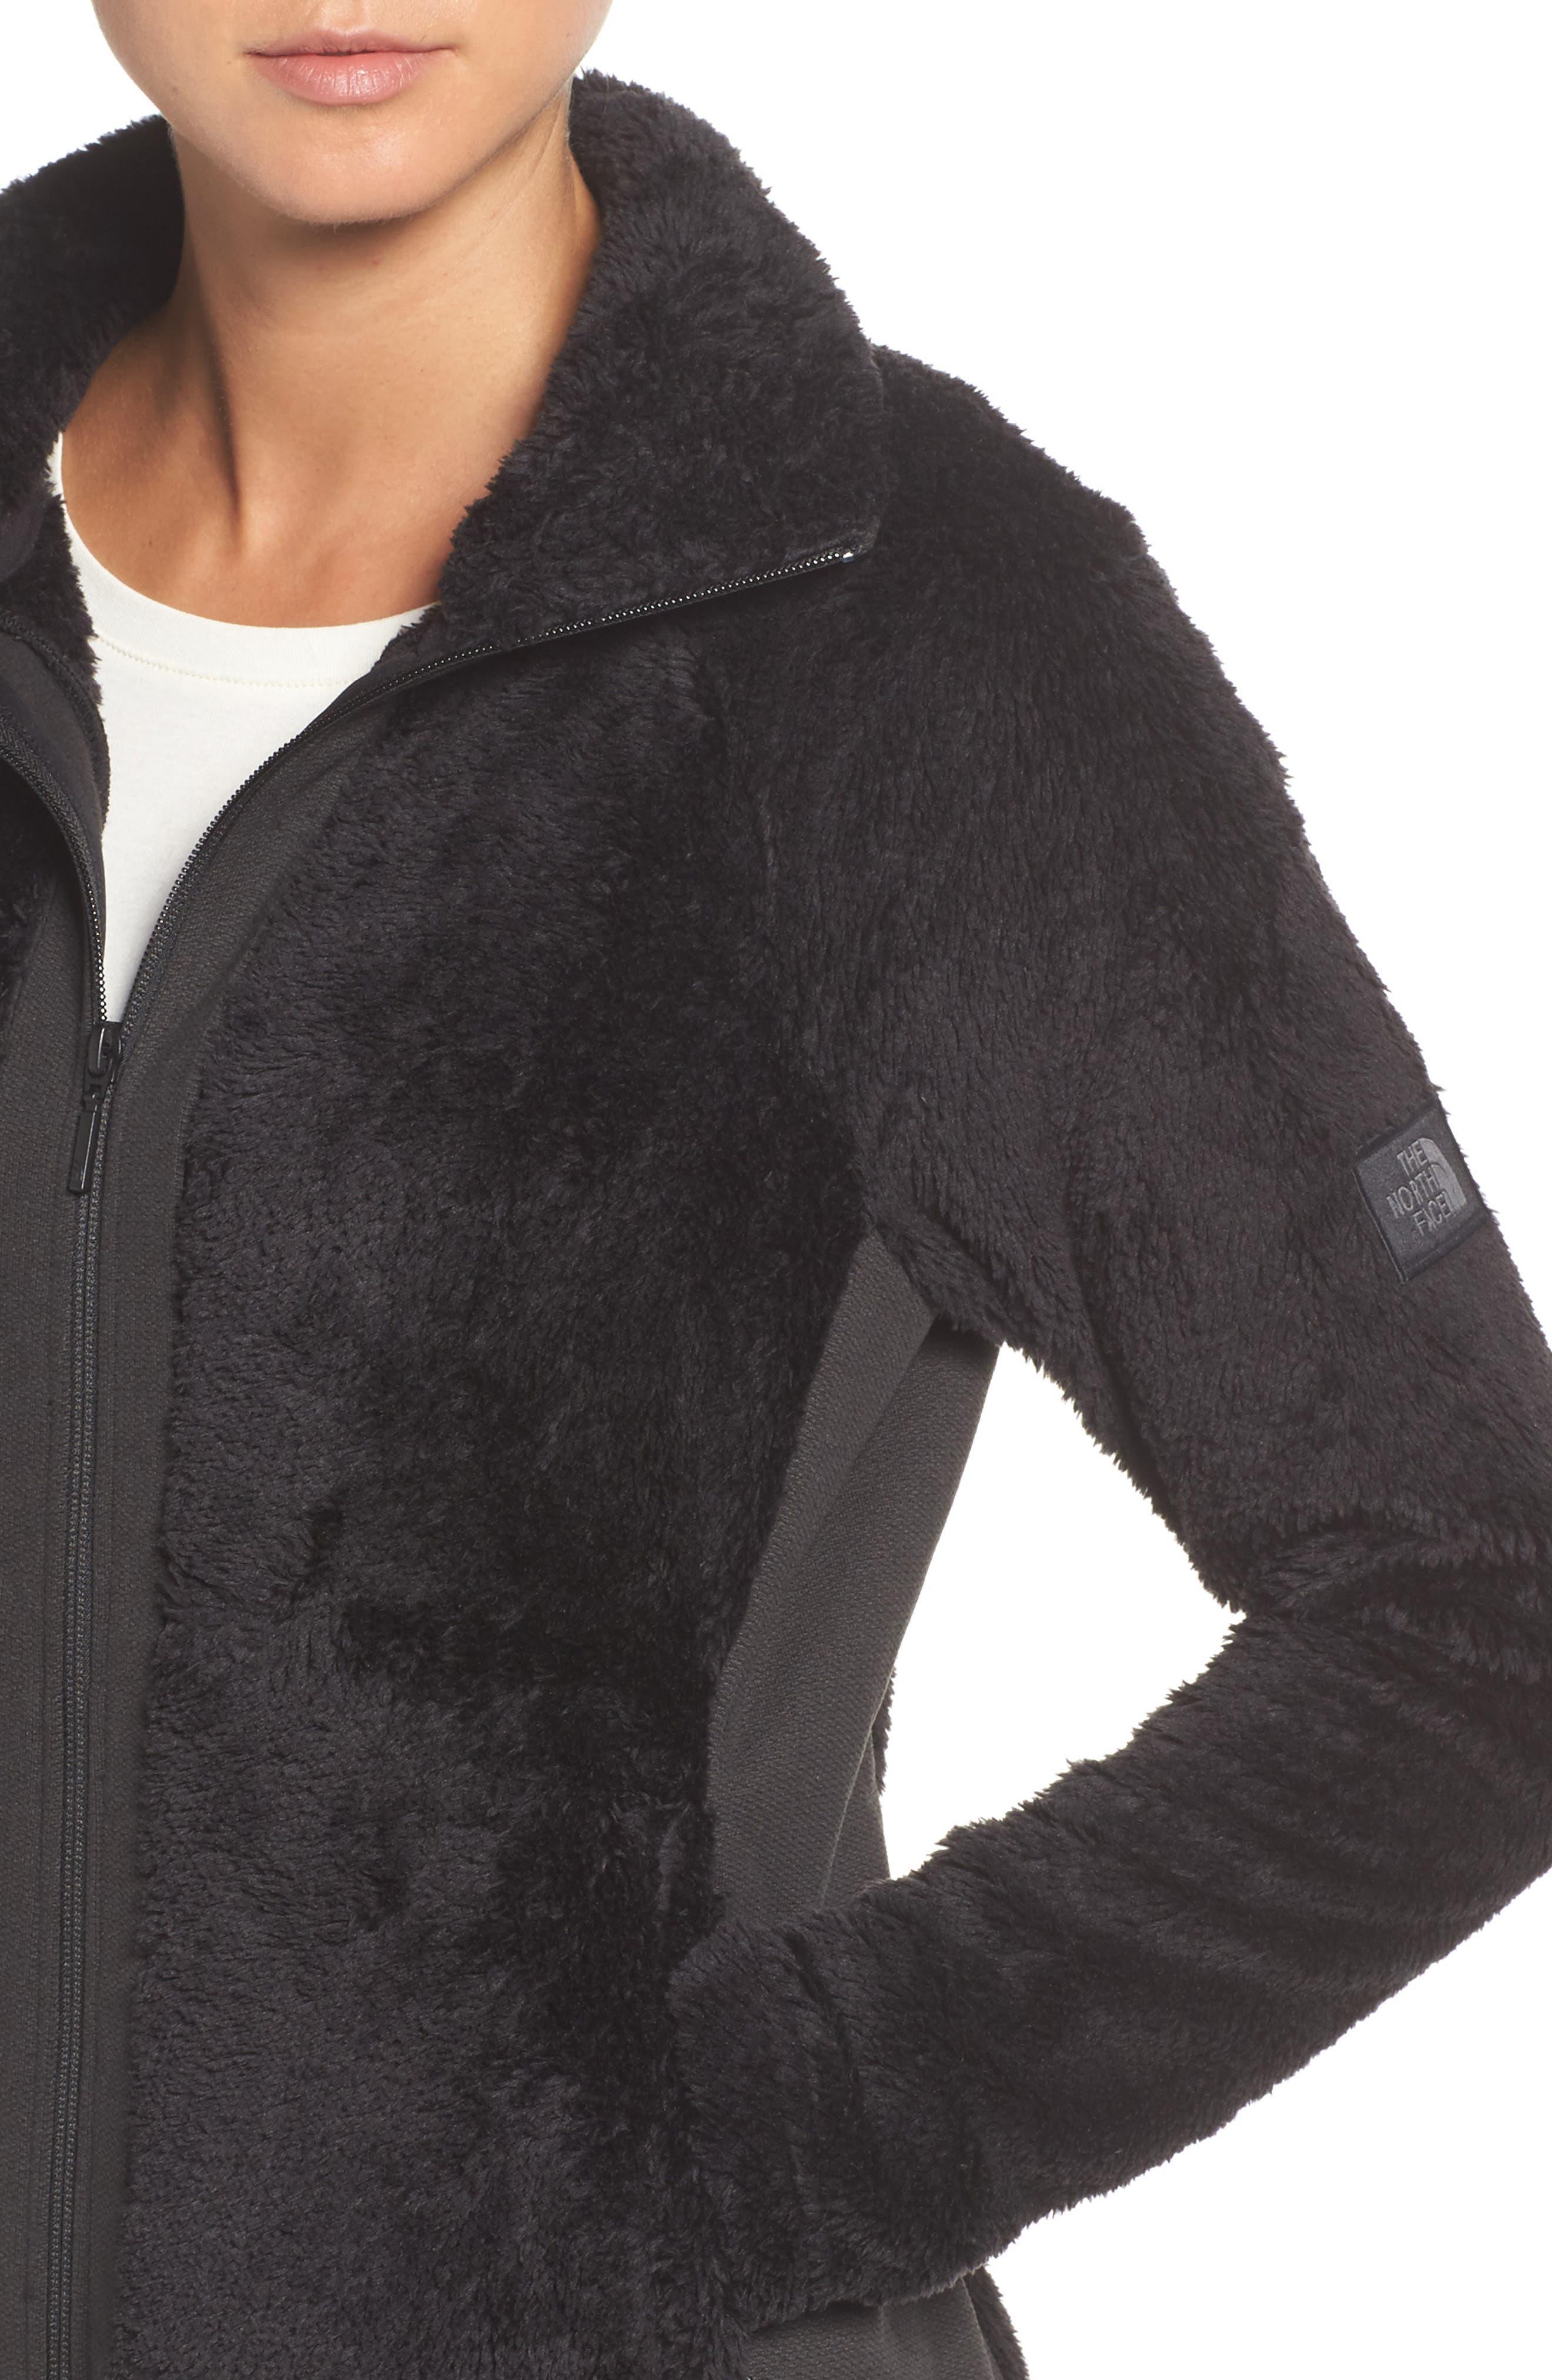 THE NORTH FACE, Furry Fleece Jacket, Alternate thumbnail 5, color, TNF BLACK